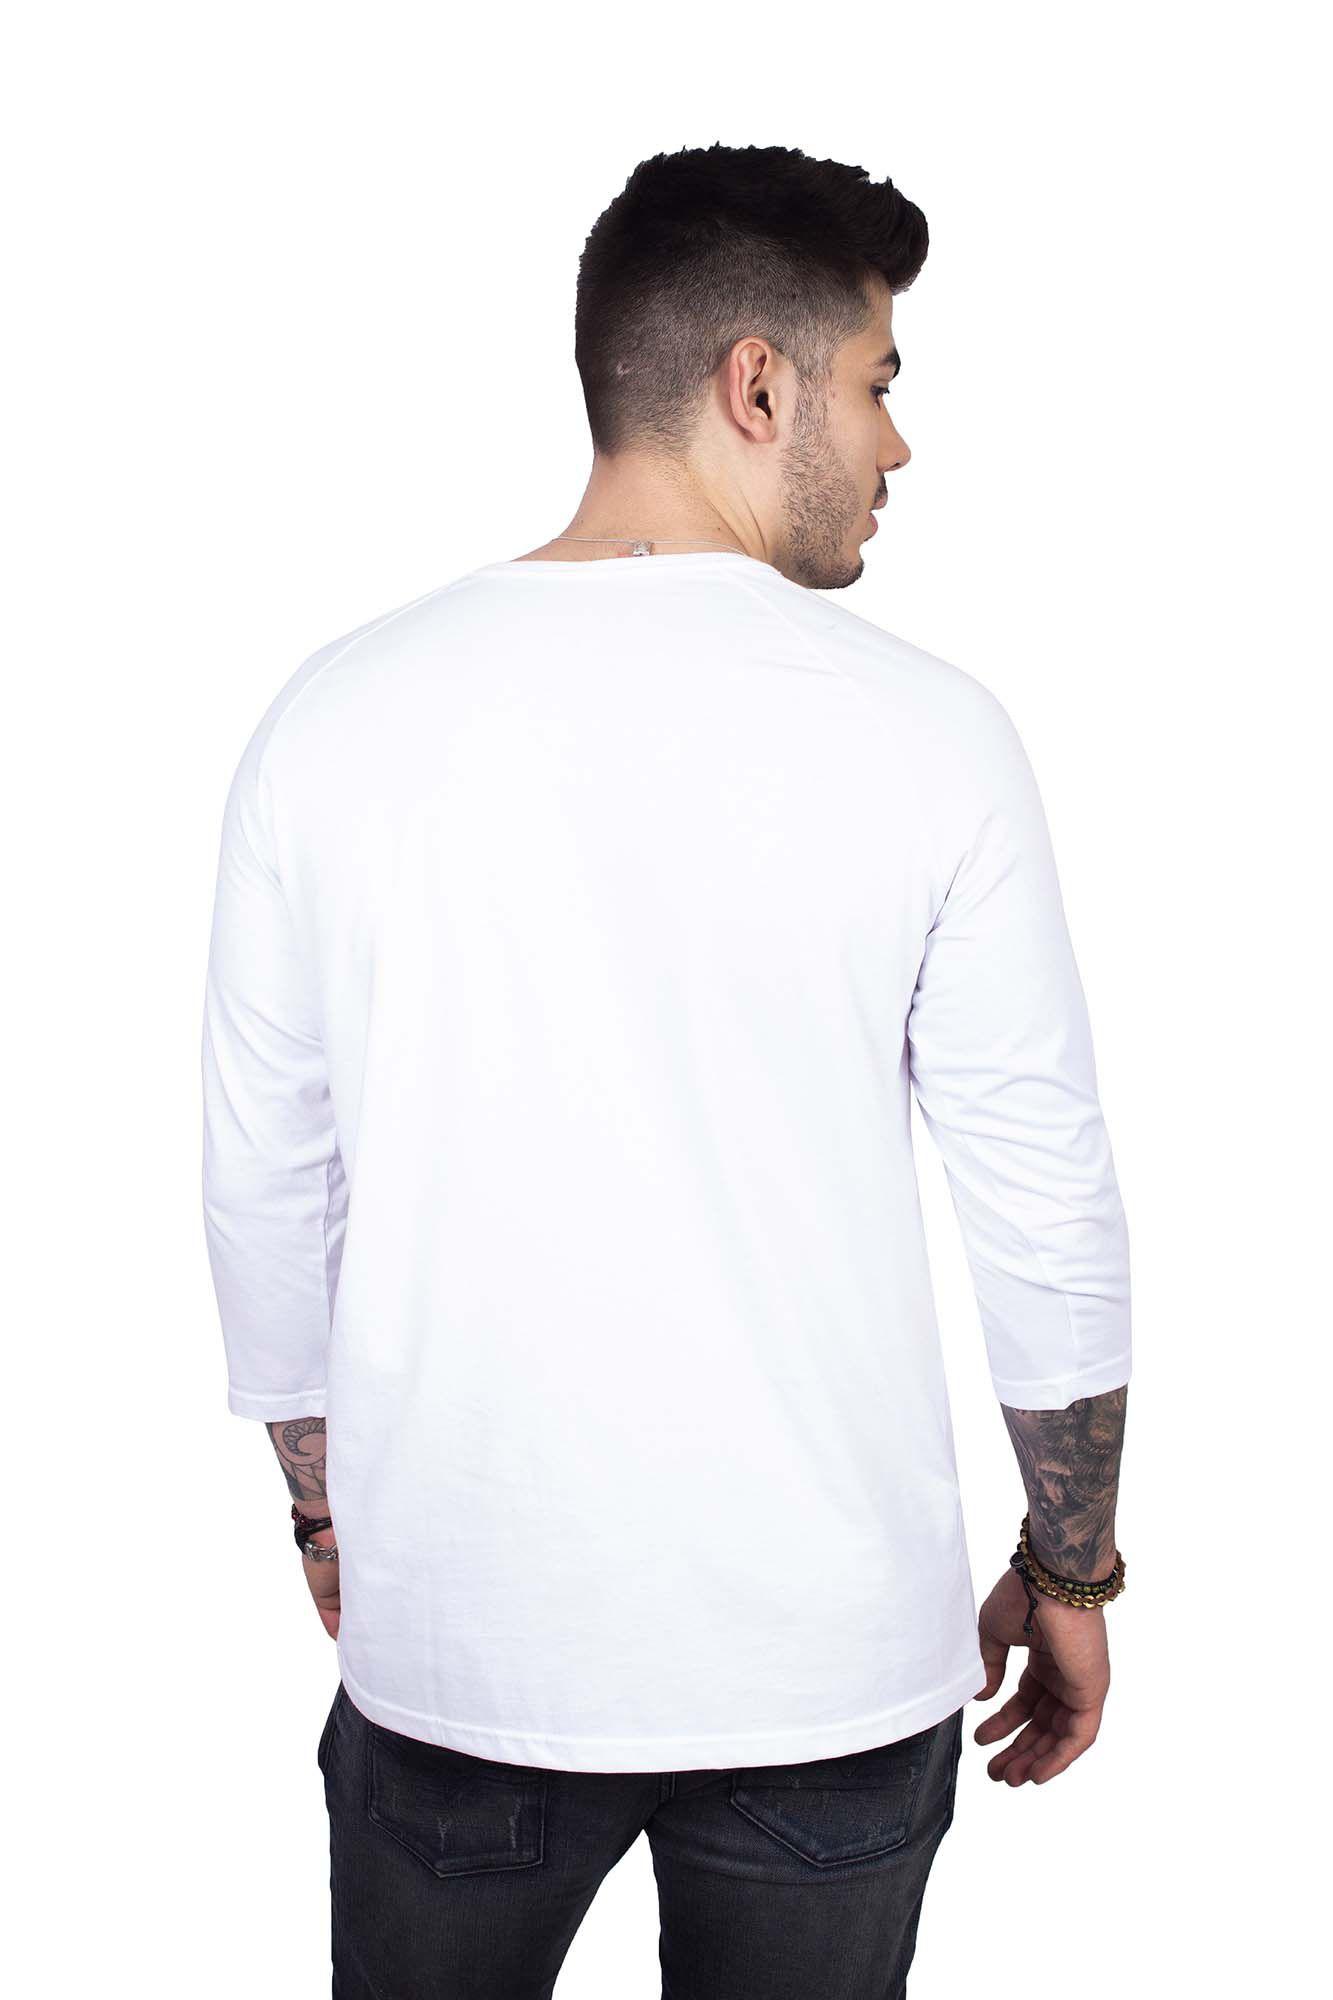 5371ad8d9 Camiseta Masculina Branca Manga Raglan Caveira Vermelha Camiseta Masculina  Branca Manga Raglan Caveira Vermelha